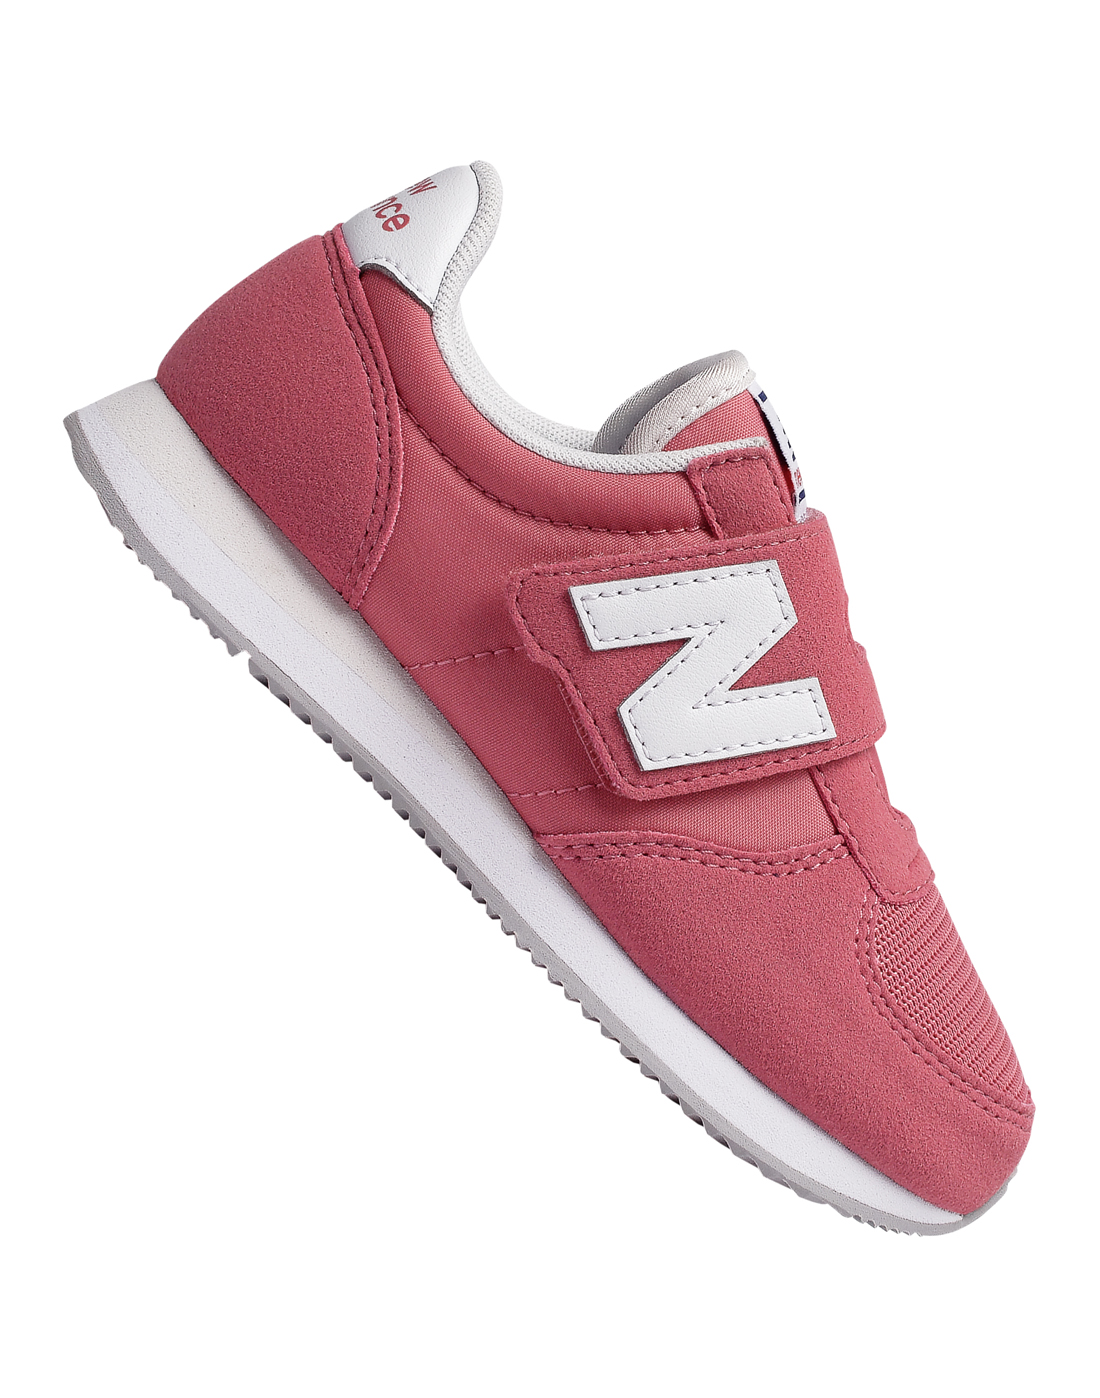 New Balance Infant Girls 220 Trainer